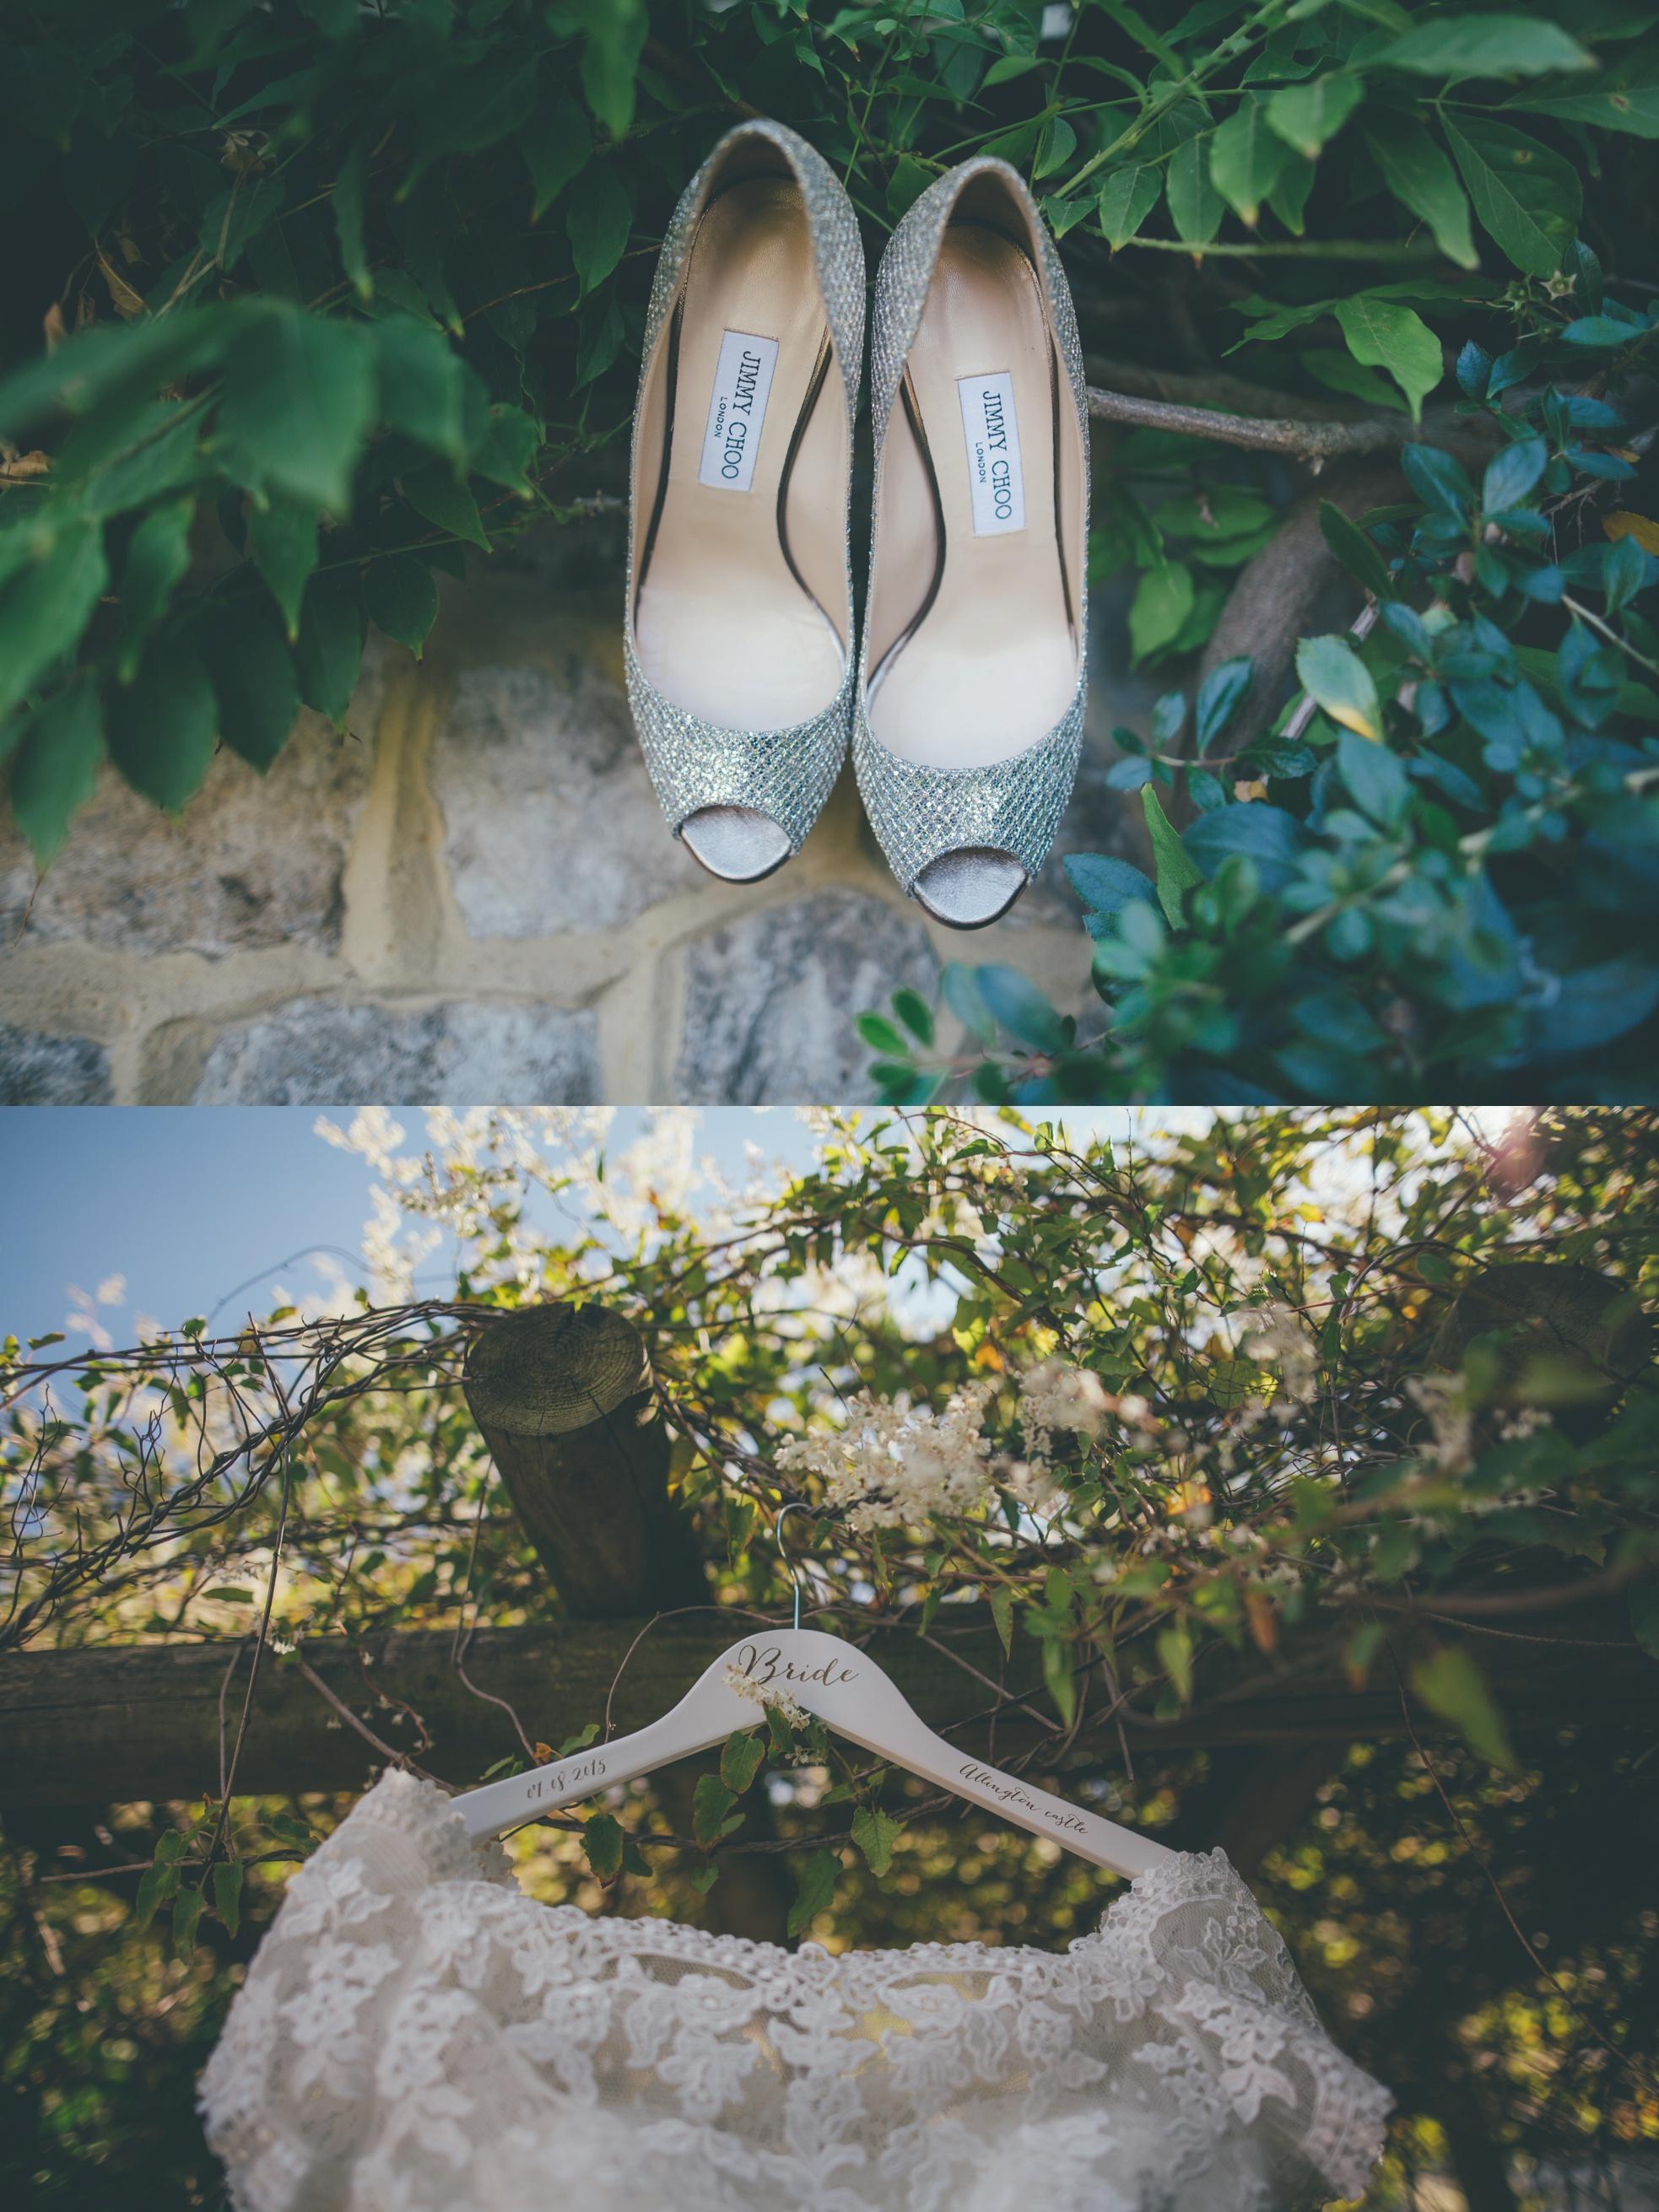 Brighton,Engagement,Kent,London,Love,Maidstone,Shooting Suzie Photography,Wedding,Wedding Photography,